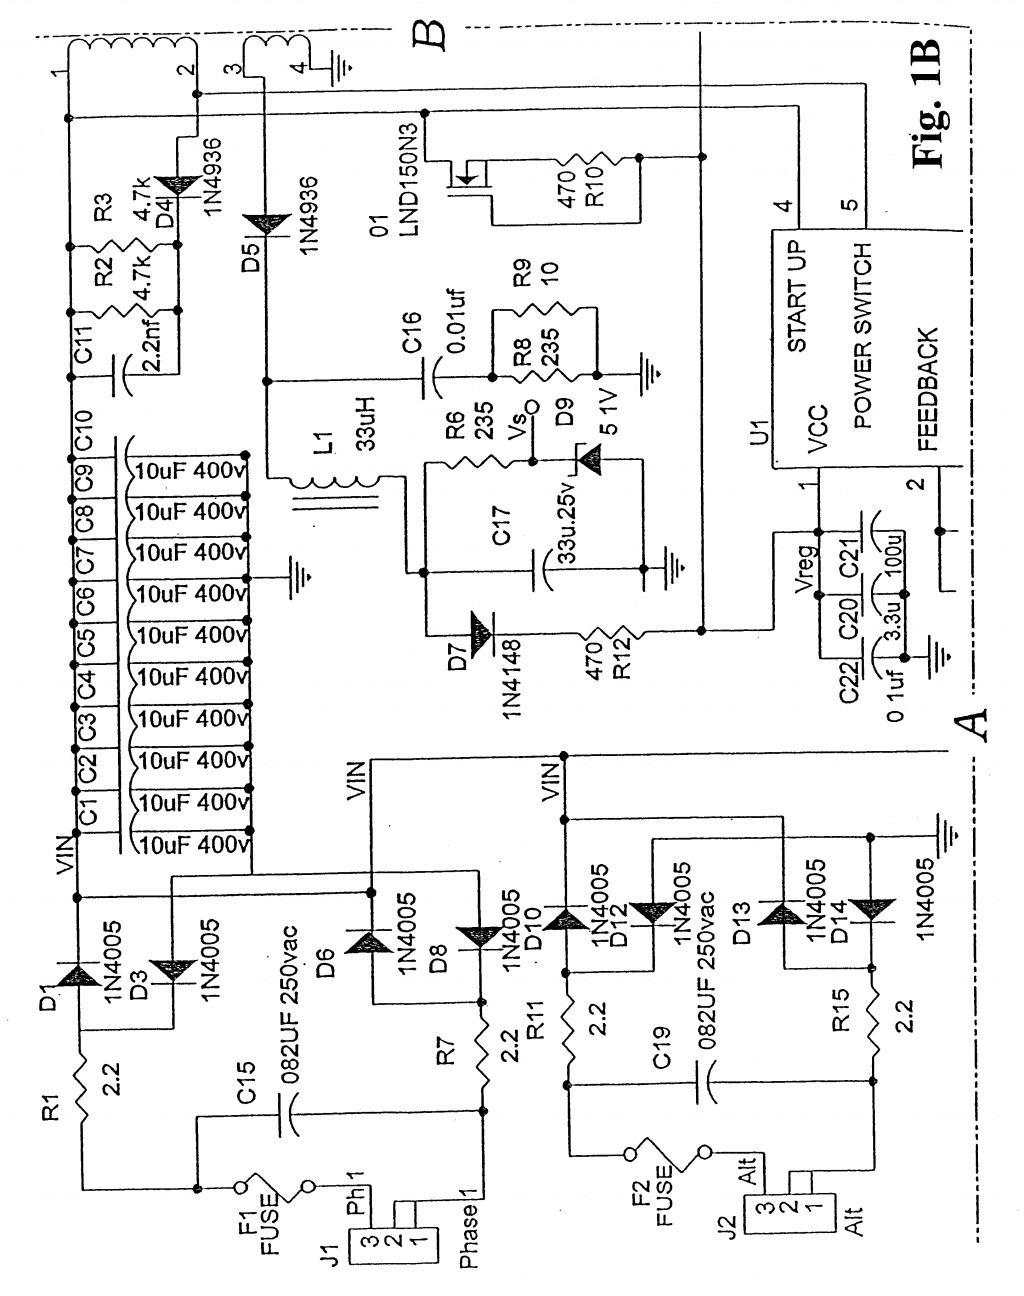 dumbwaiter wiring diagram - 2000 camaro fuel pump wiring diagram -  furnaces.deco-doe4.decorresine.it  furnaces.deco-doe4.decorresine.it